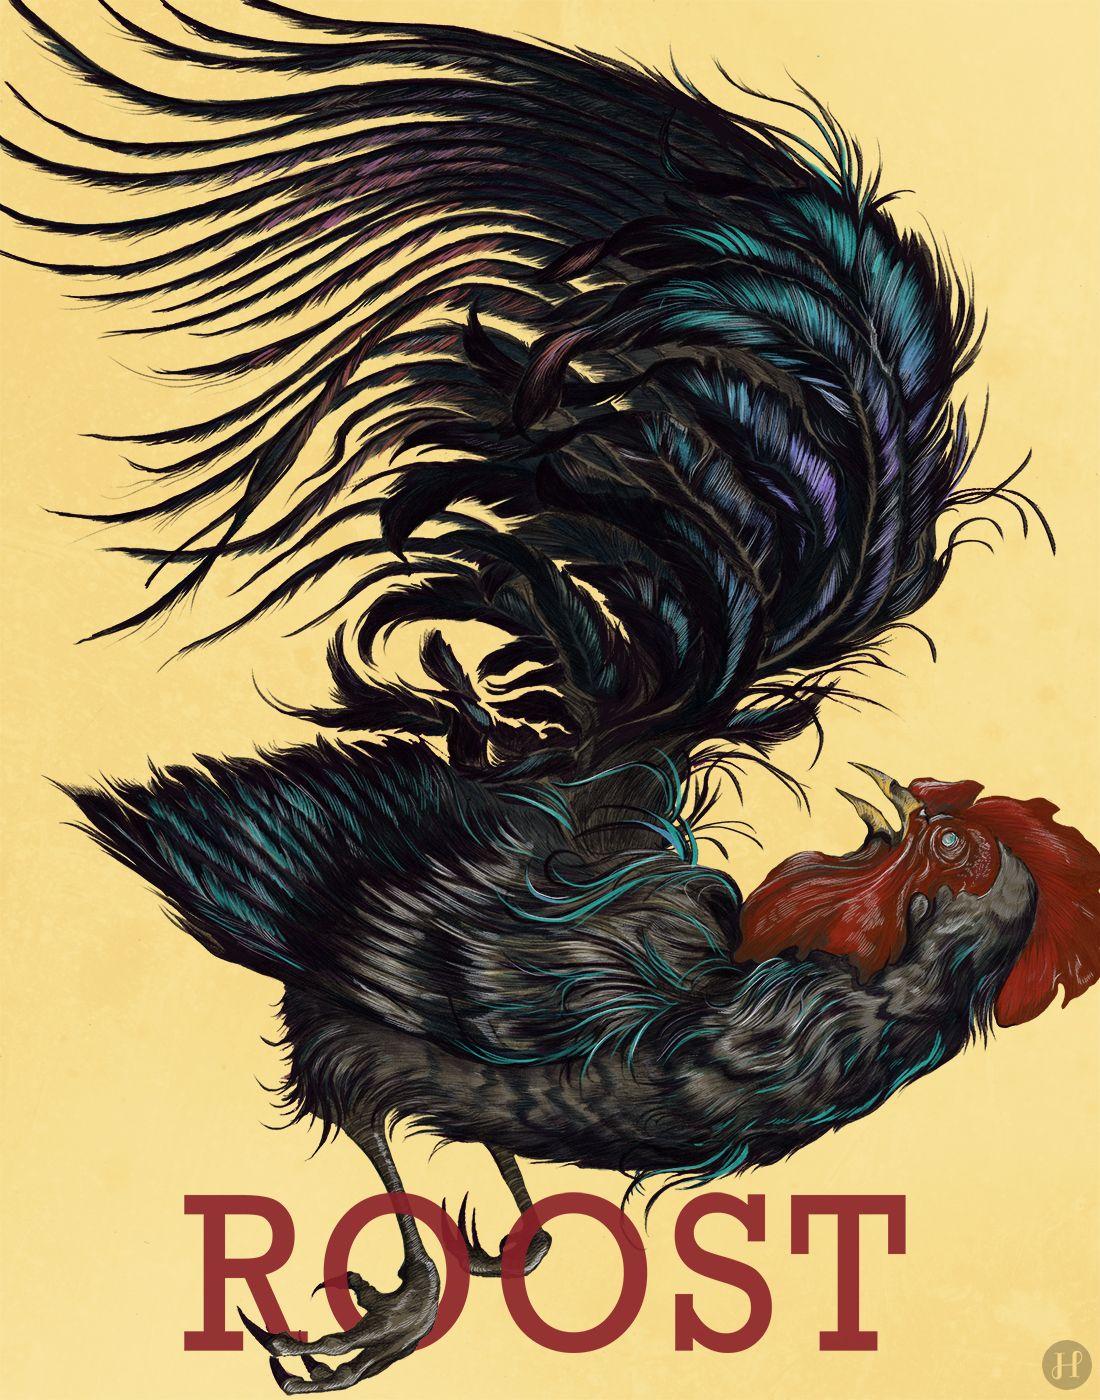 Year of the Rooster illustration by Derik Hobbs. www.instagram.com/deriknhobbs